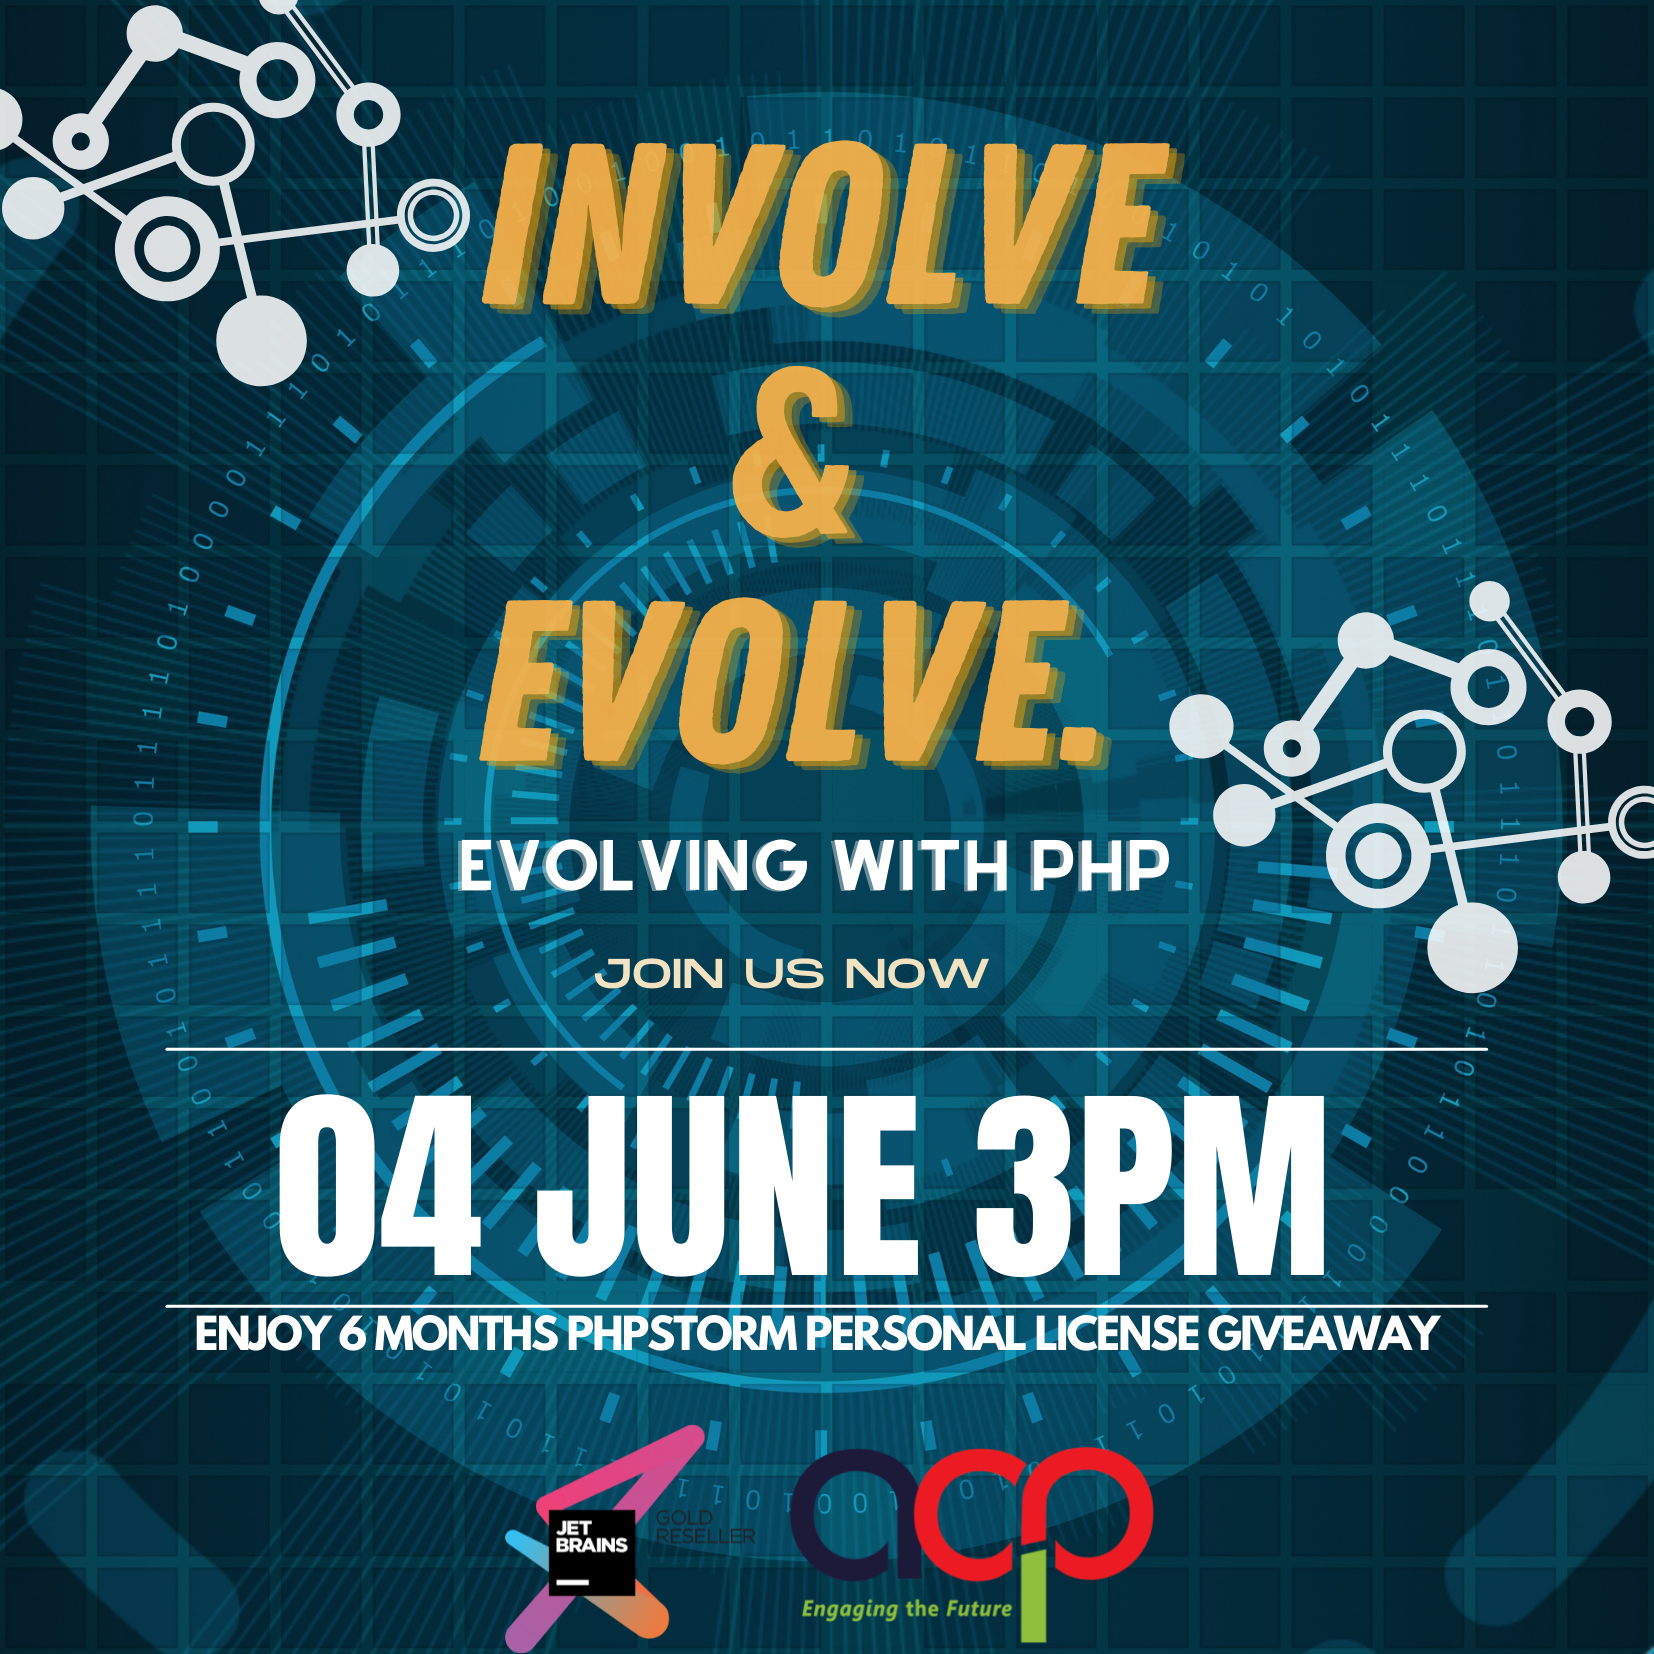 Involve and Evolve